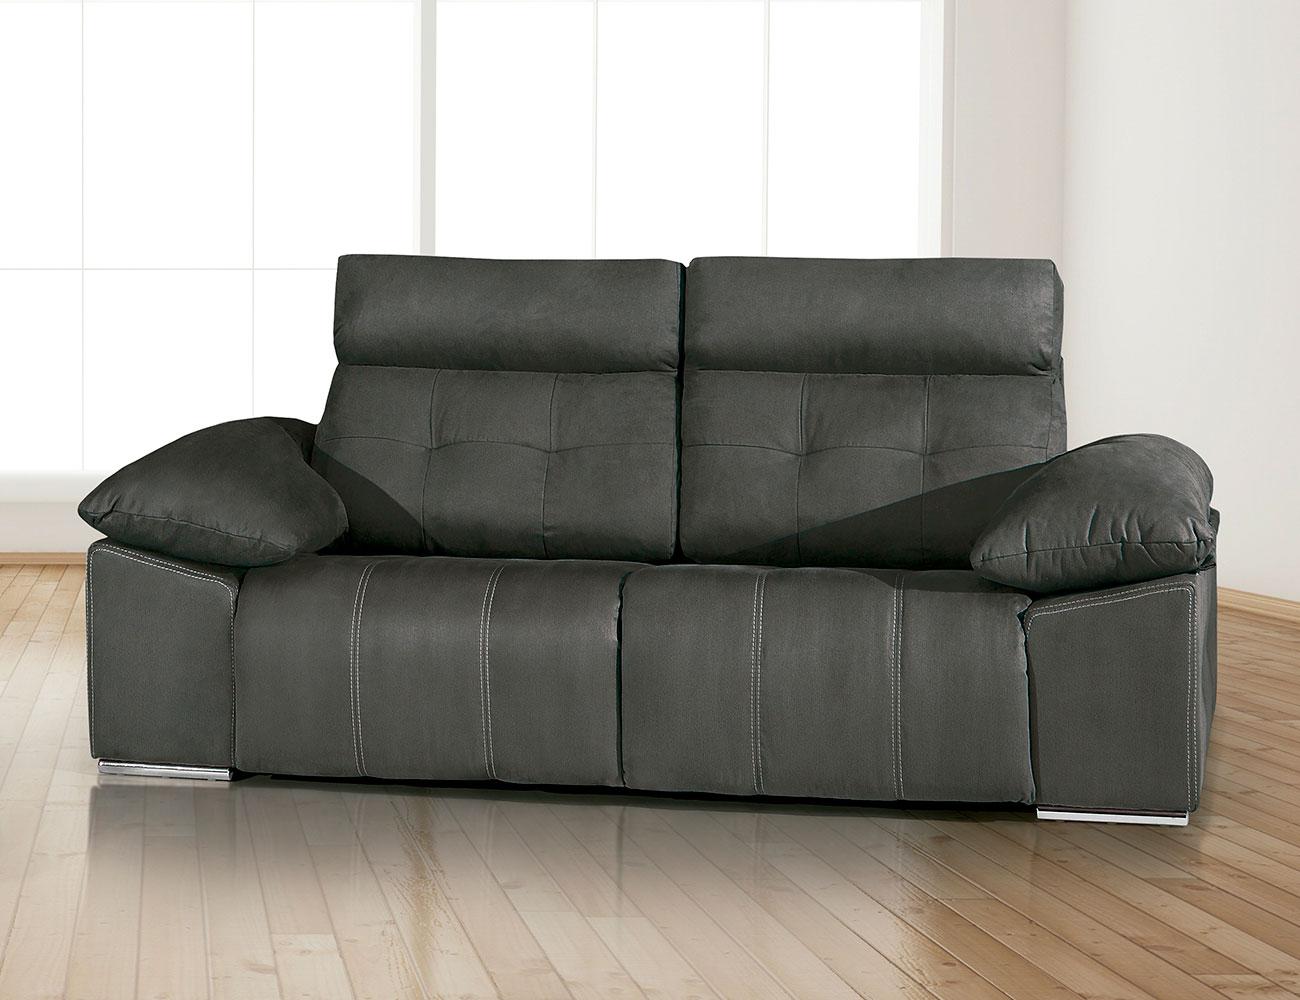 Sofa 3 plazas electrico tejido dante2